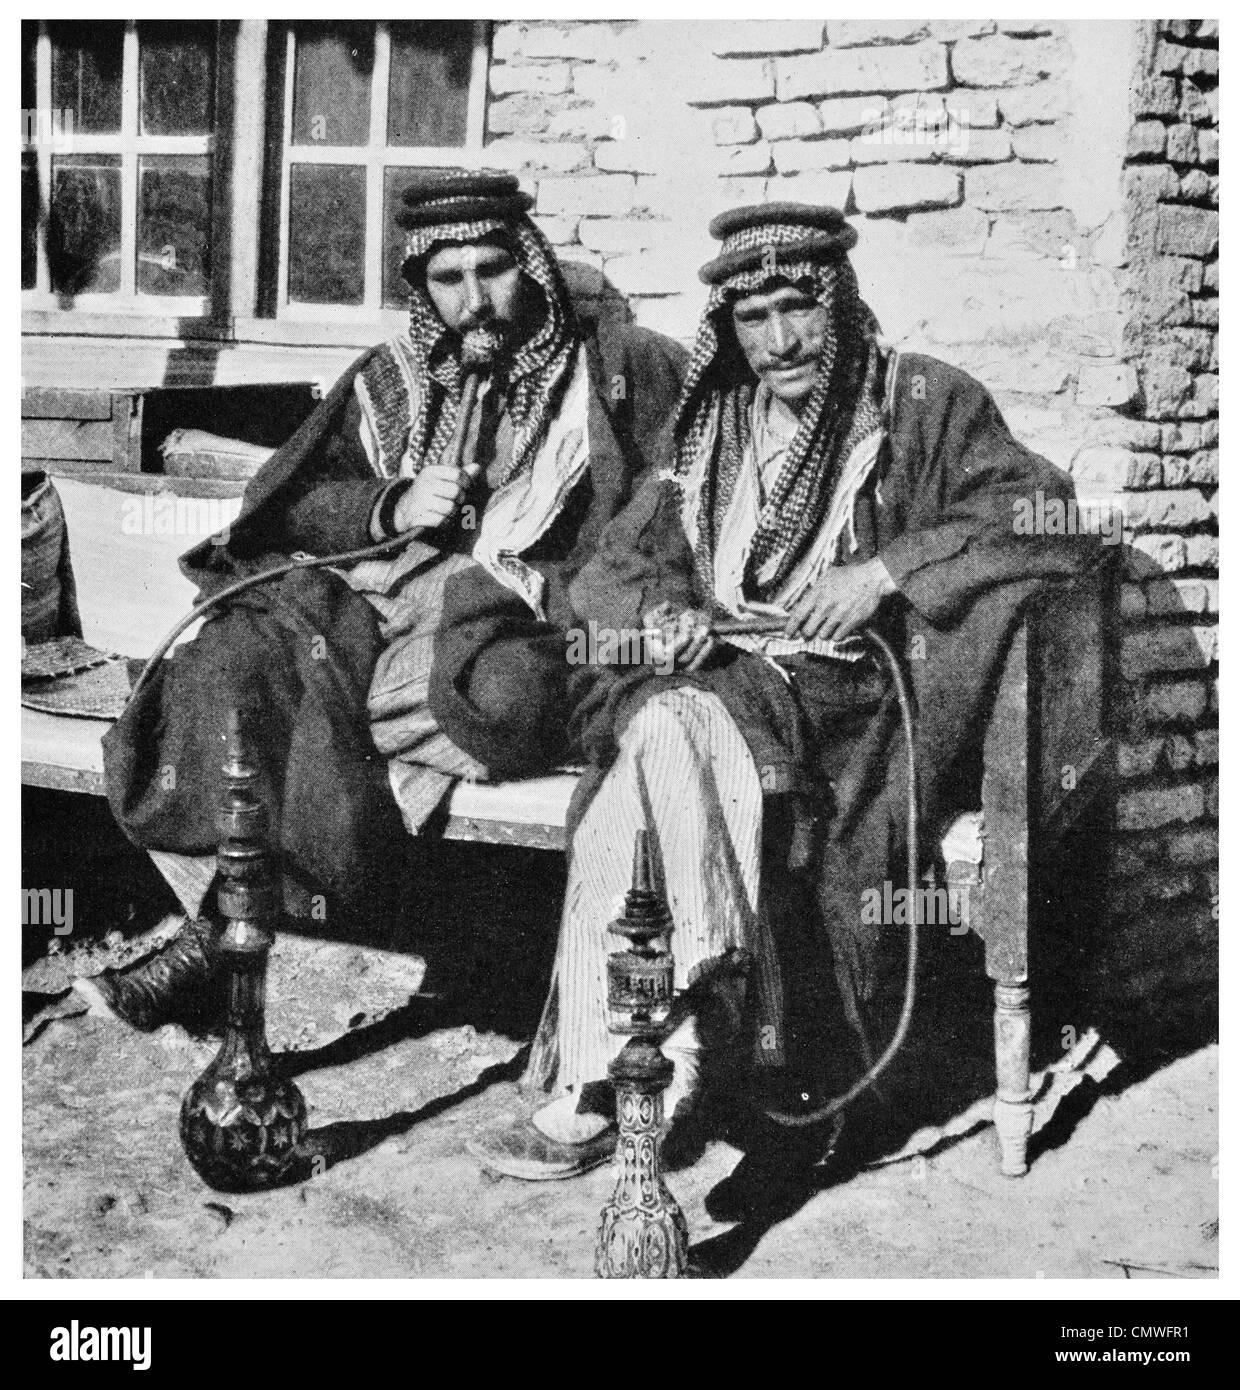 1925 desert Arabs of high degree smoking the water pipe Narghile coffee shop - Stock Image